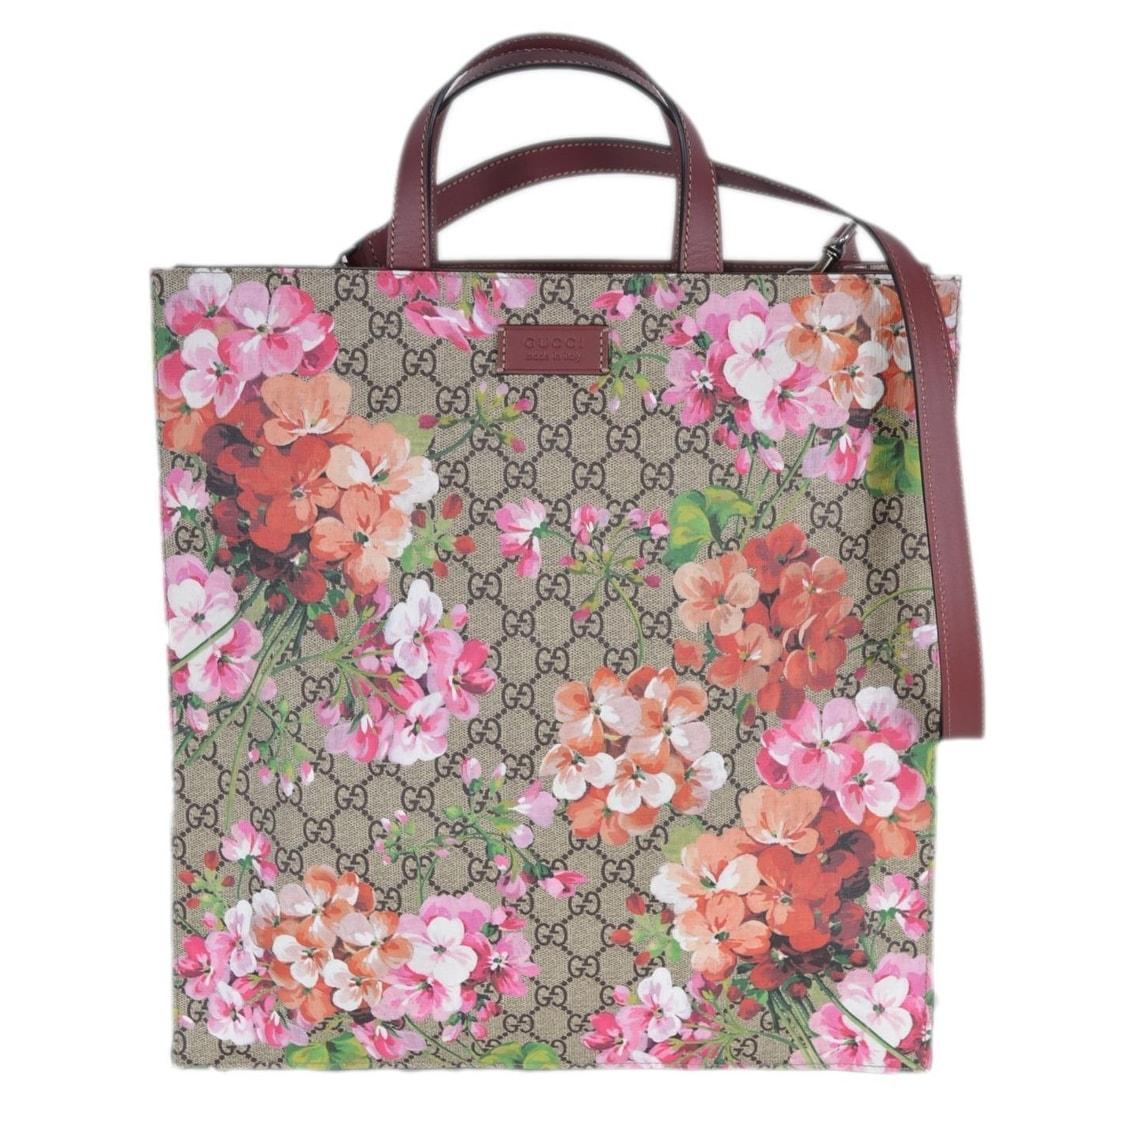 5846b9368c6 Gucci Designer Handbags